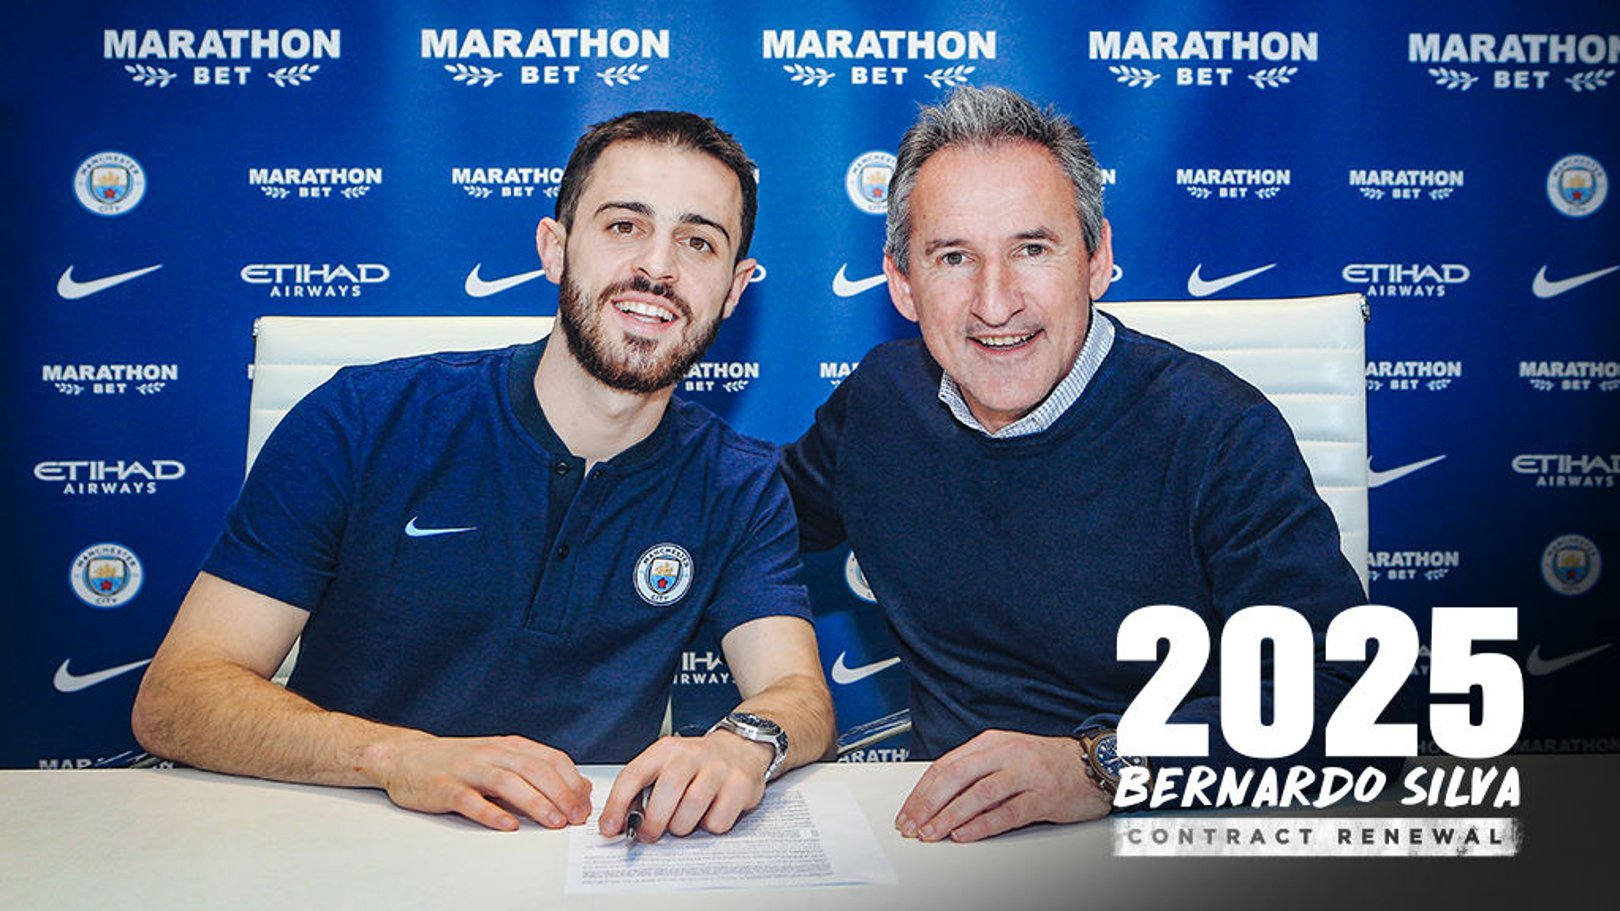 2025: Bernardo Silva has signed a new Manchester City contract